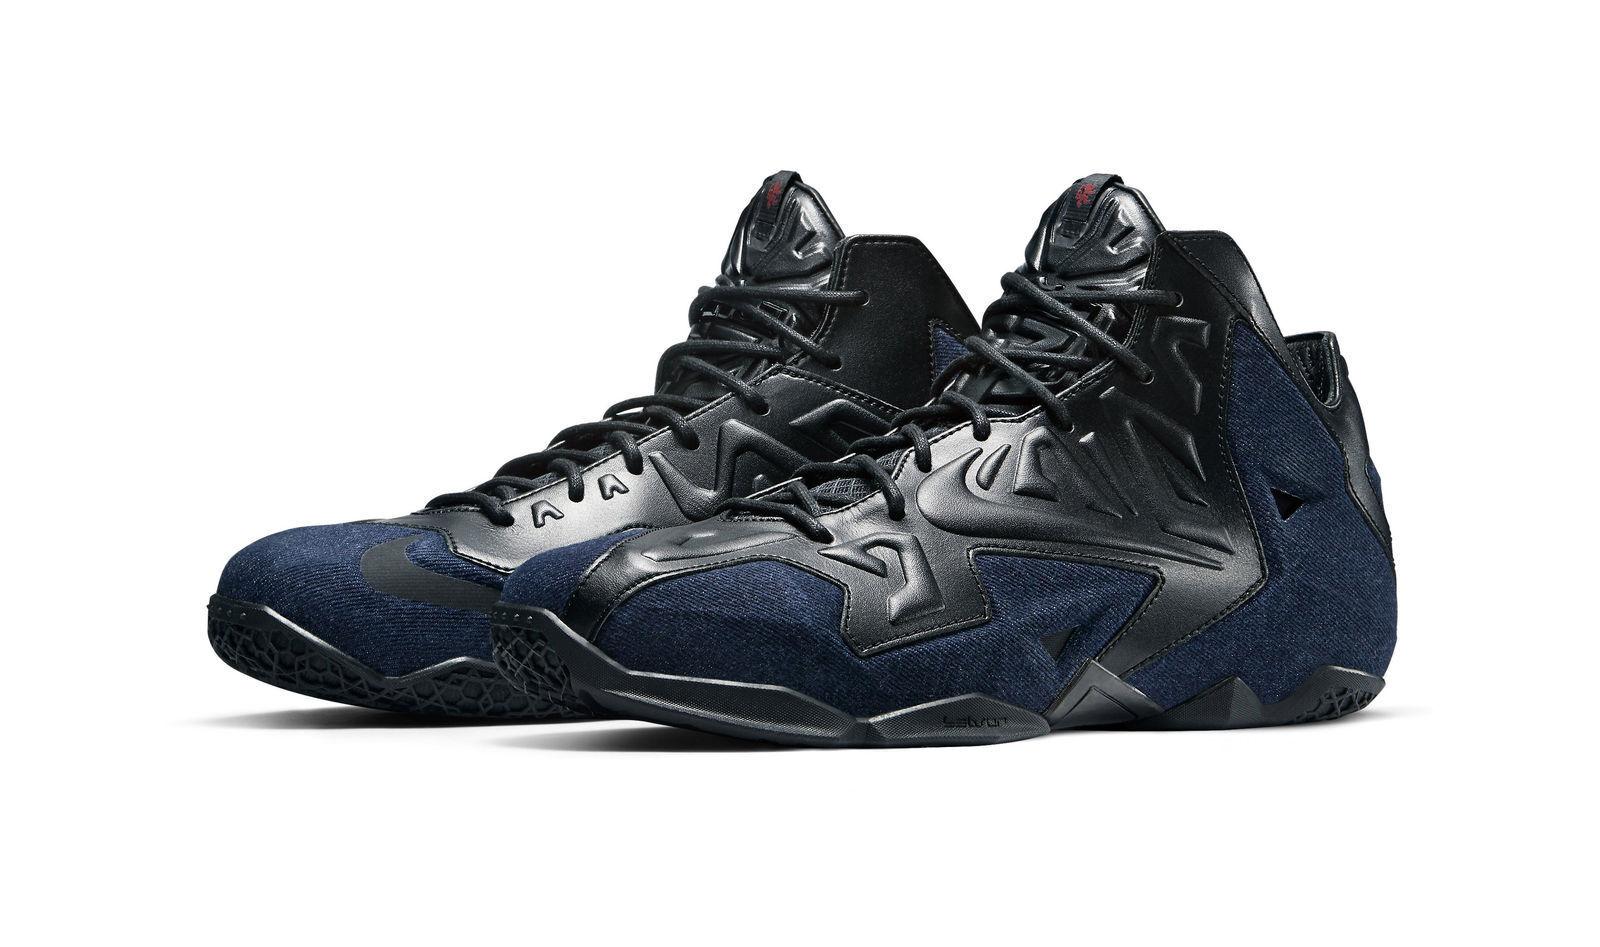 c176c467e7f Nike Lebron XI 11 EXT QS Denim Blue Black 659509-004 Sz 10 for sale ...